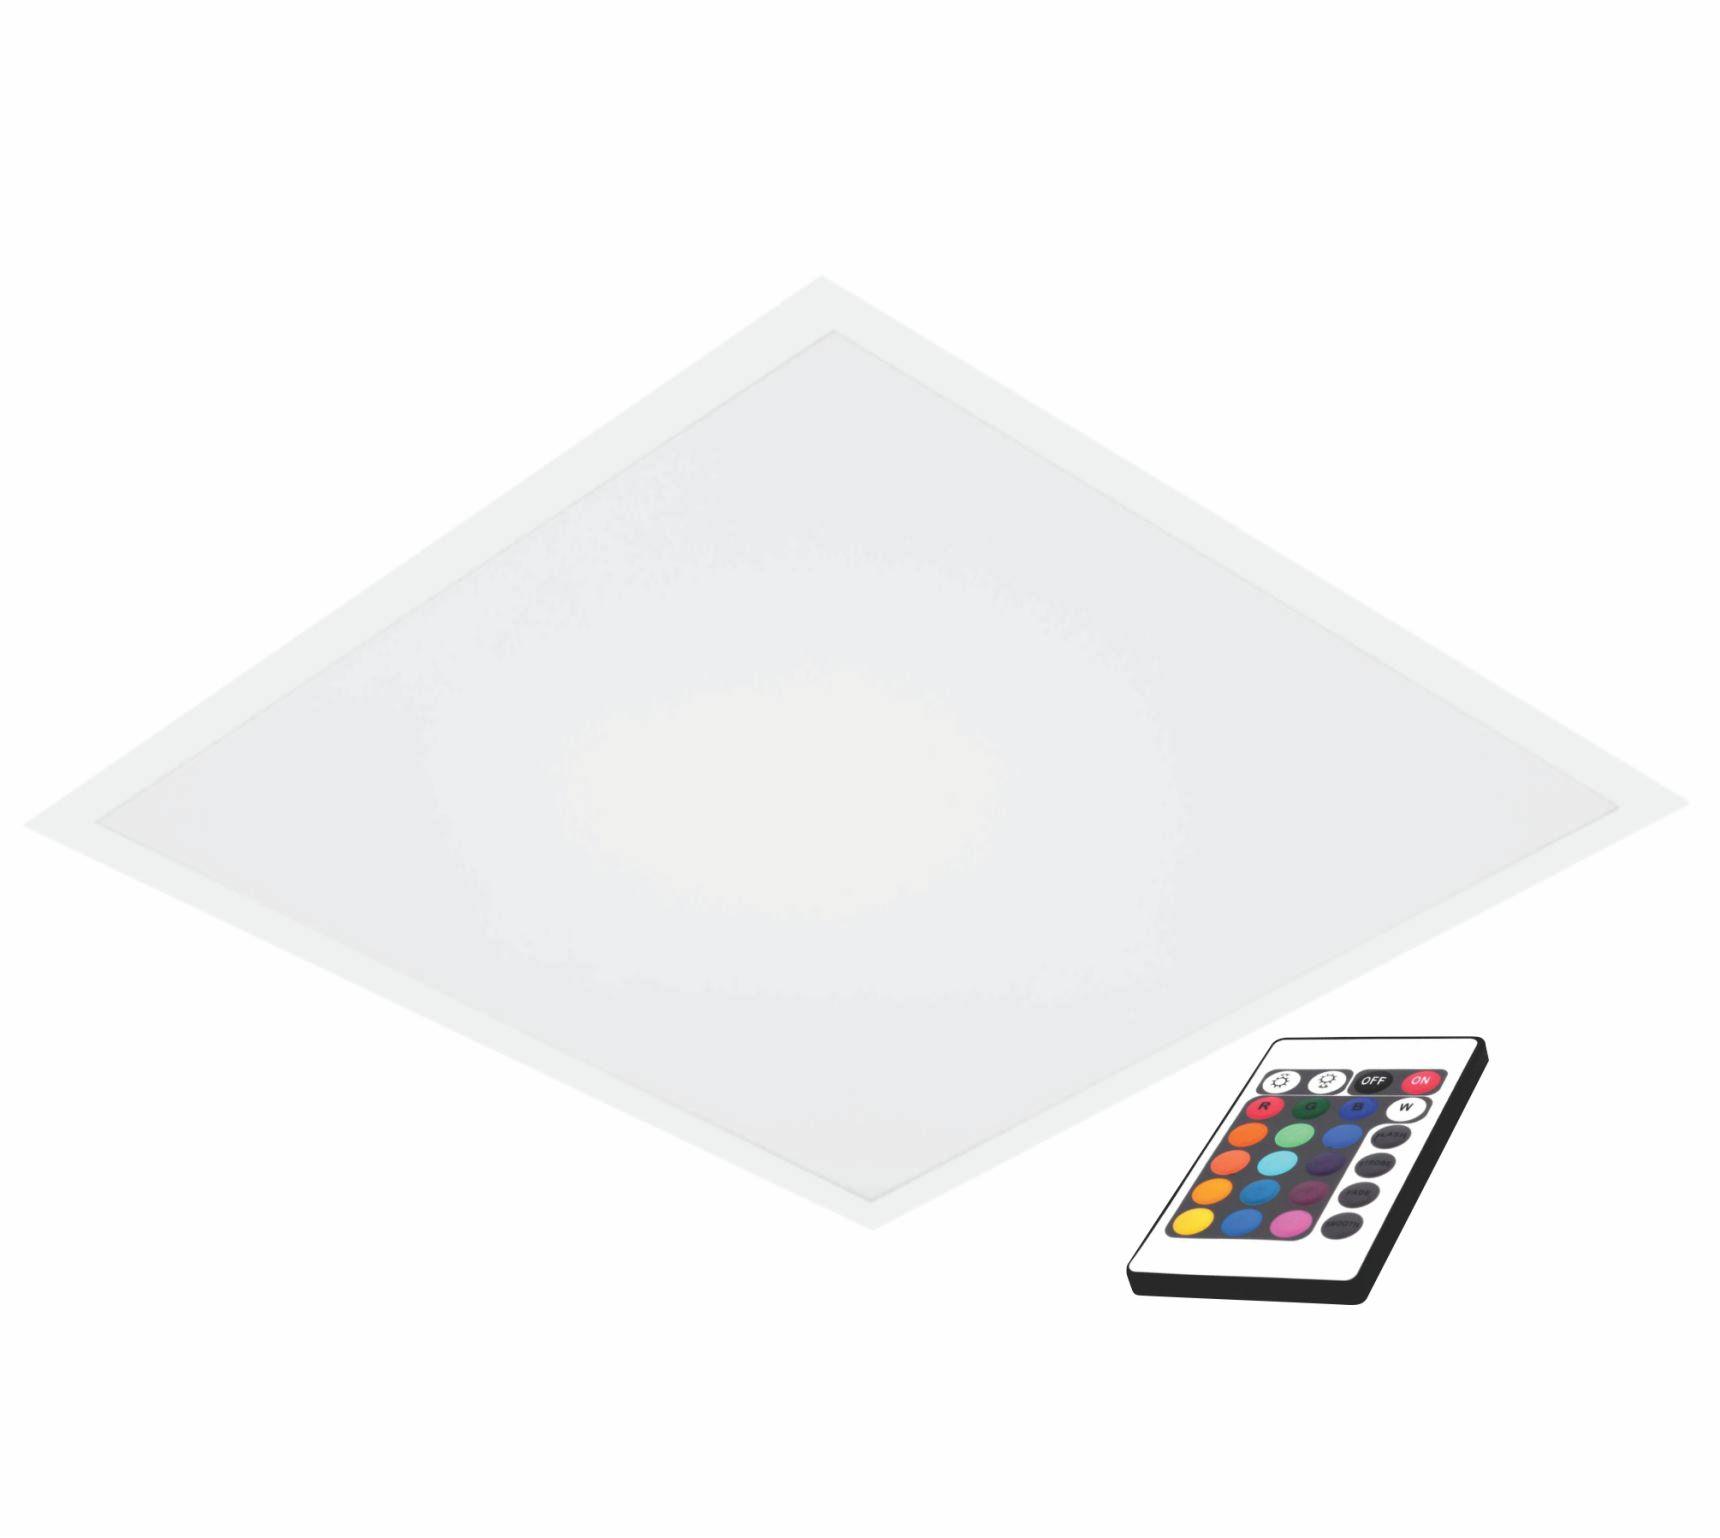 Painel Slim Embutir RGB Quadrado 30w 120 Auto